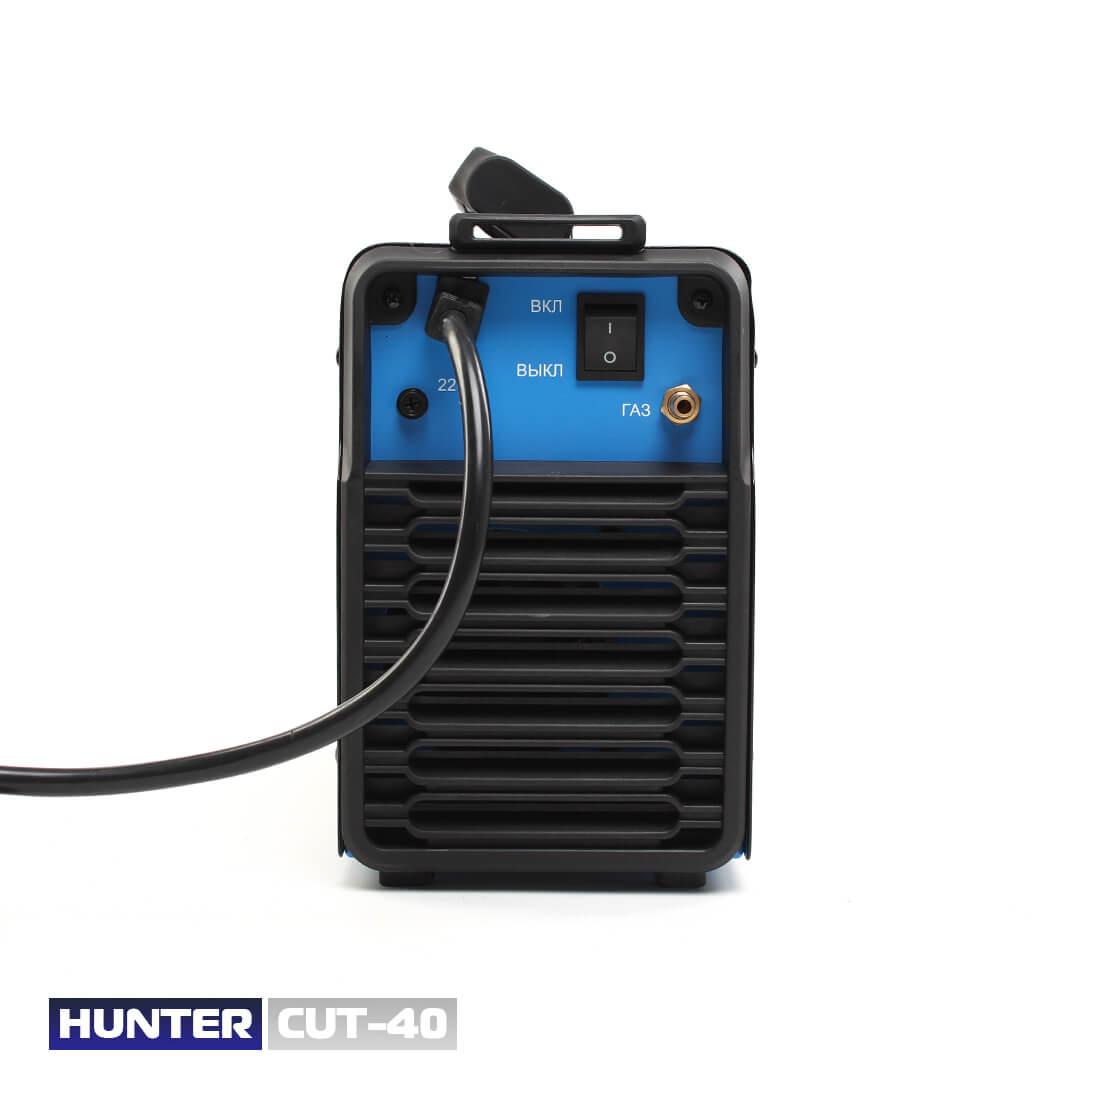 Фото Hunter CUT-40 (плазморез) цена 6350грн №4 — Hunter